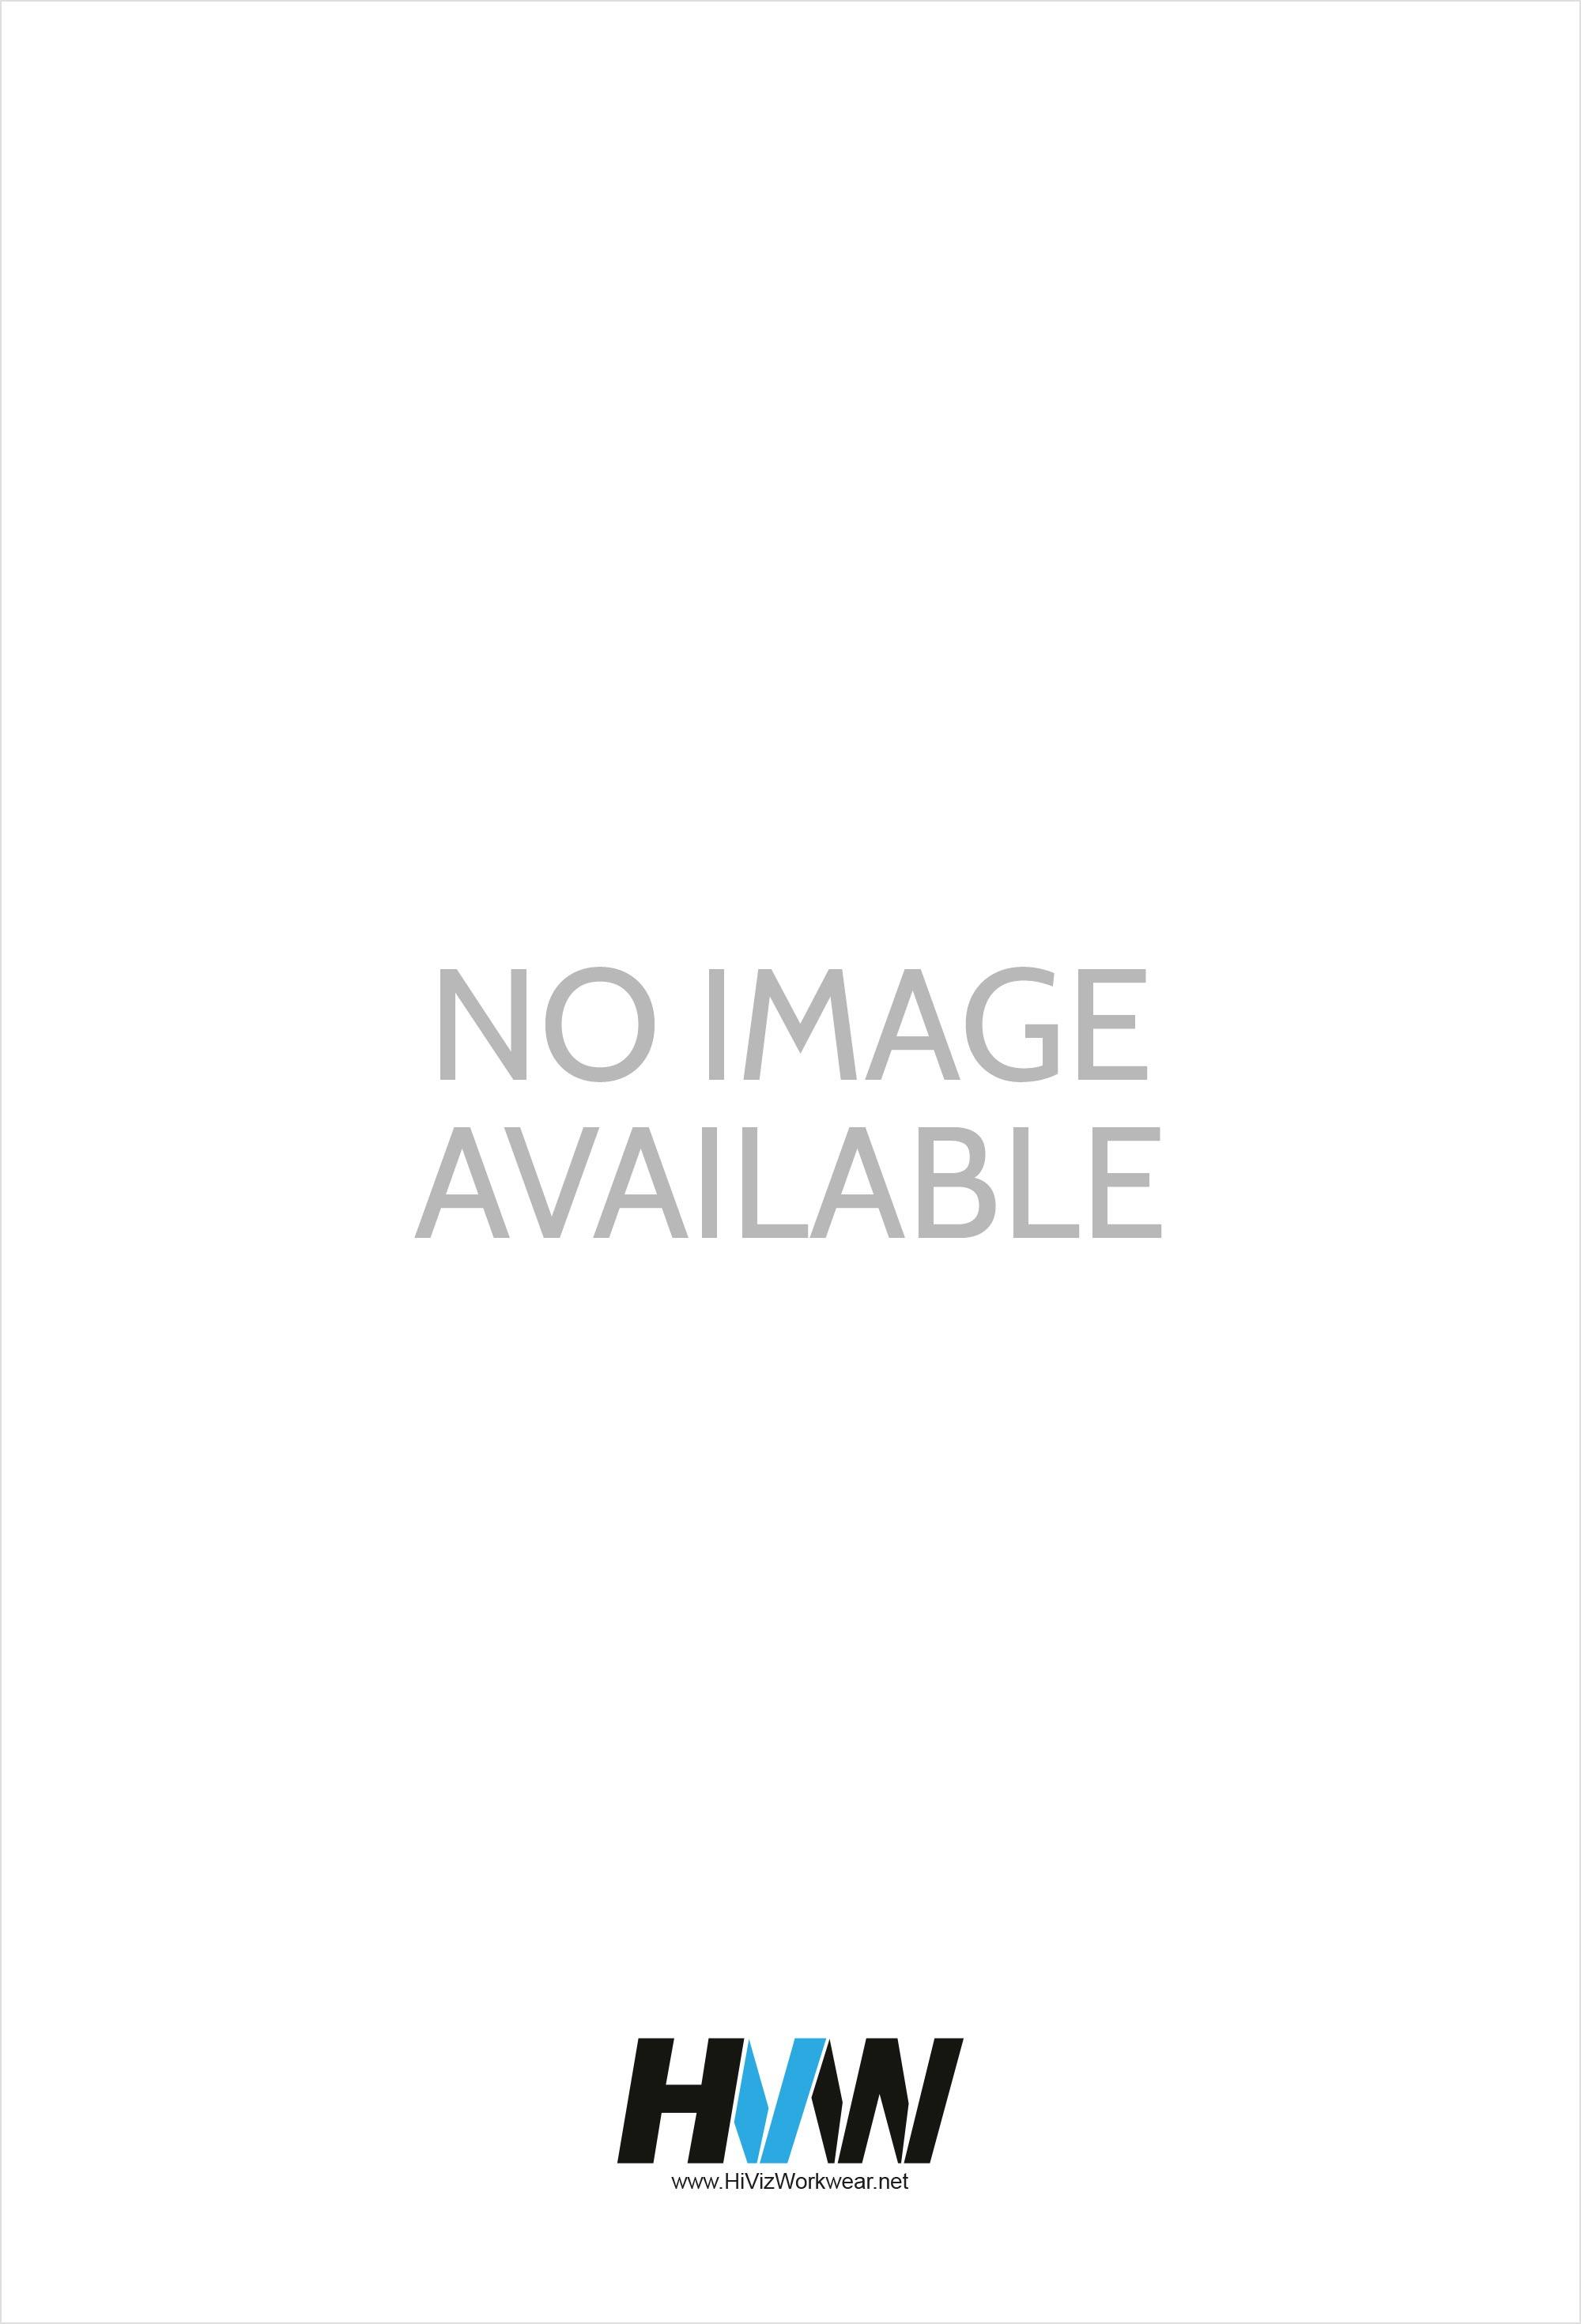 Kariban KB533 Long Sleeve EasyCare OxFord Shirt  (S To 6XL)